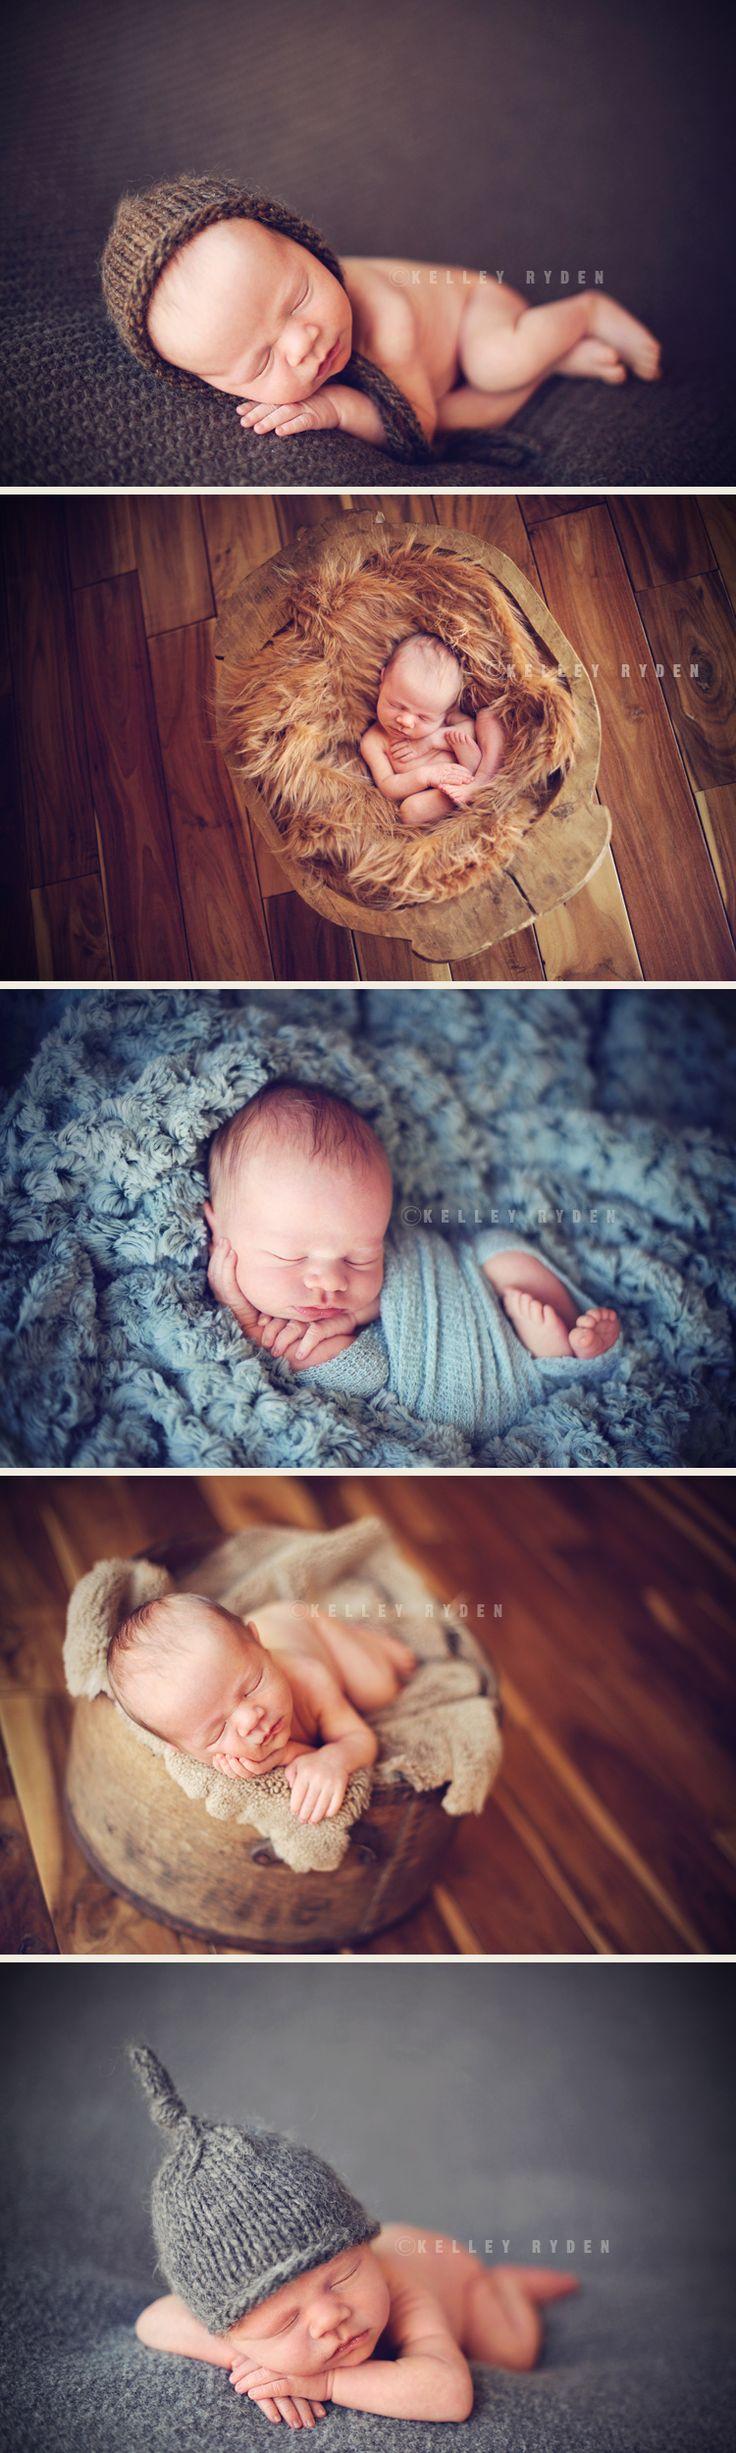 .: Baby Photographers, Baby Boy Poses, Newborns Baby, Photog Baby, Newborn Baby Boys, Baby Baby, Kelleyryden, Baby Poses, Baby Photos